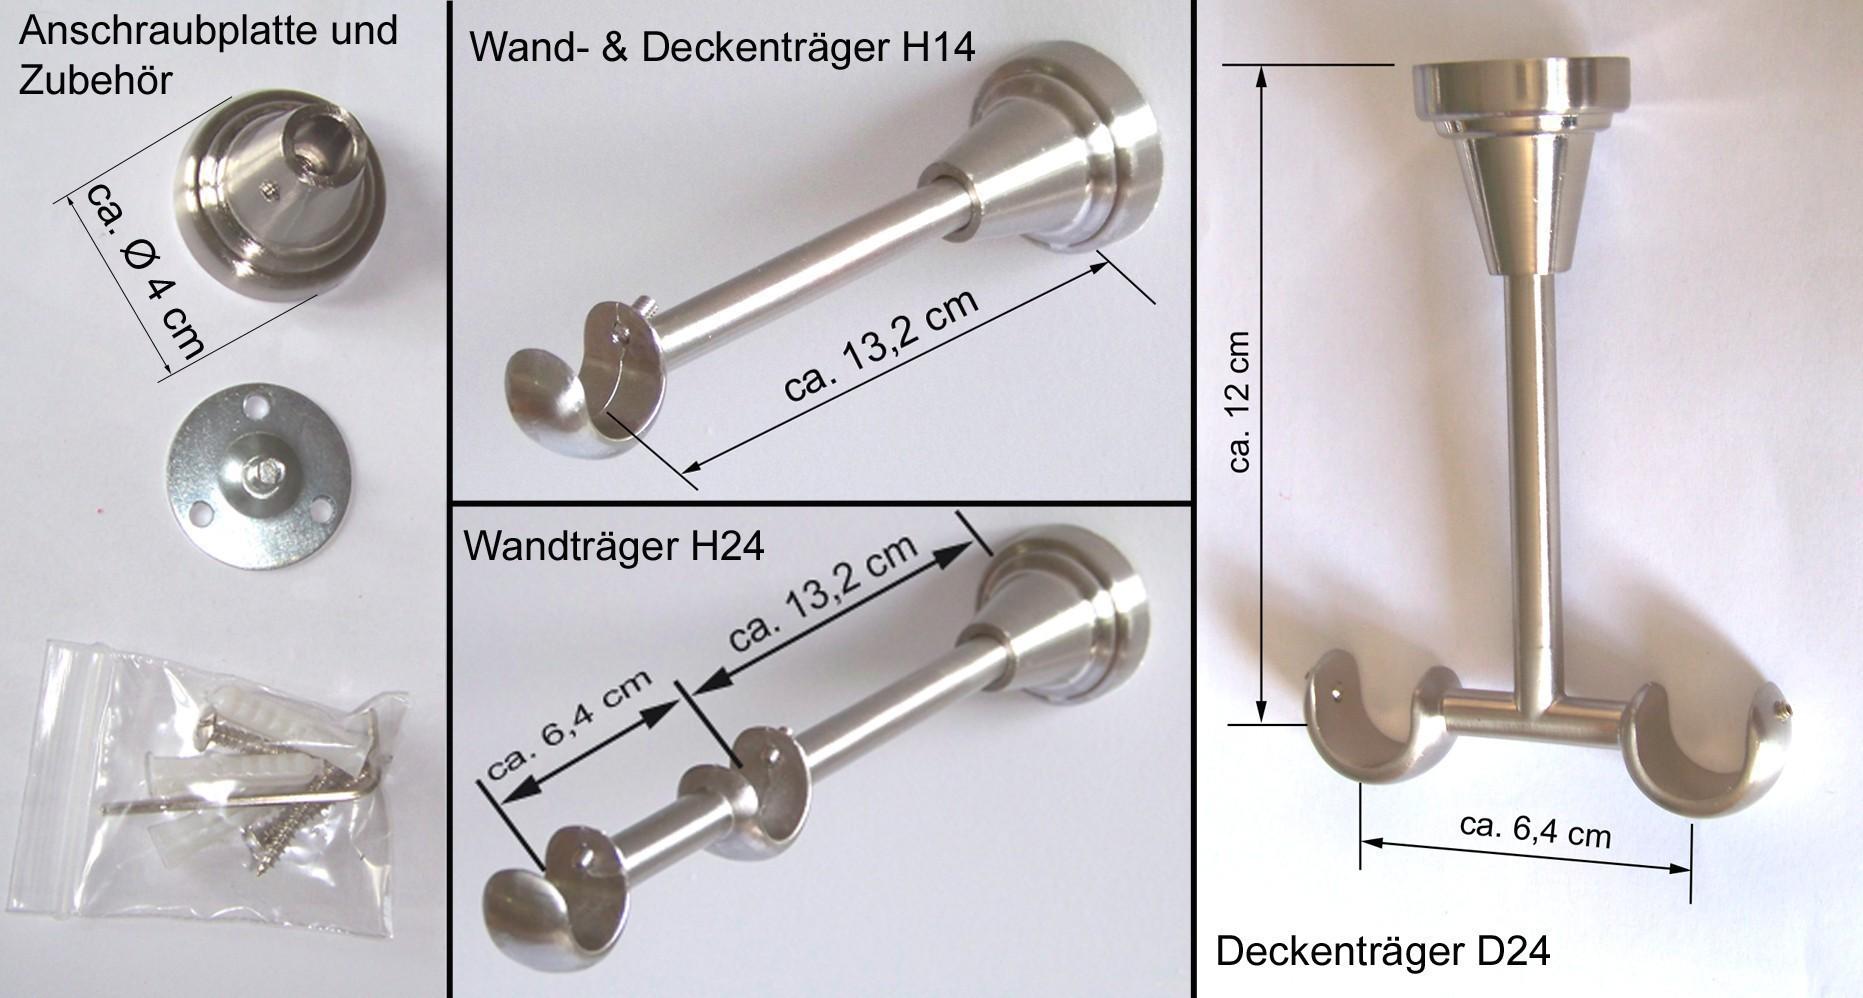 gardinenstange edelstahl look 16mm wand deckentr ger oder zusatzlauf holz e52 gardinenstangen. Black Bedroom Furniture Sets. Home Design Ideas